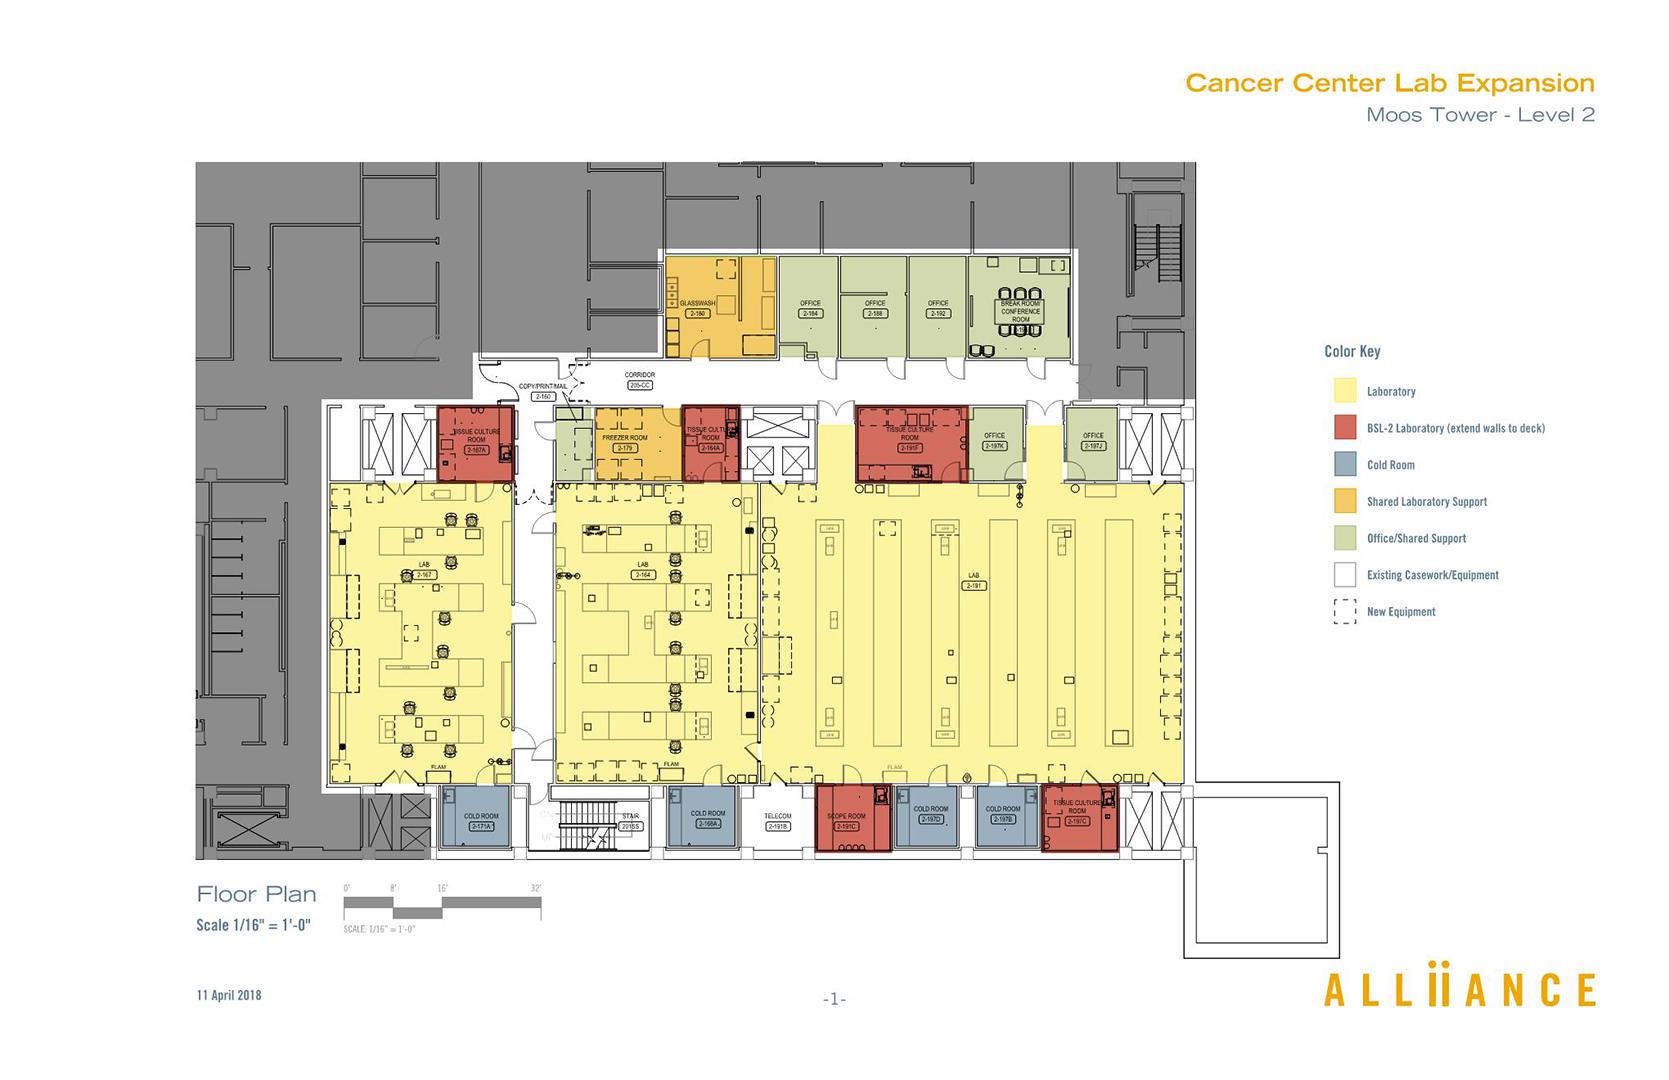 Moos Tower 2nd Floor Cancer Center Umn Capital Project Management